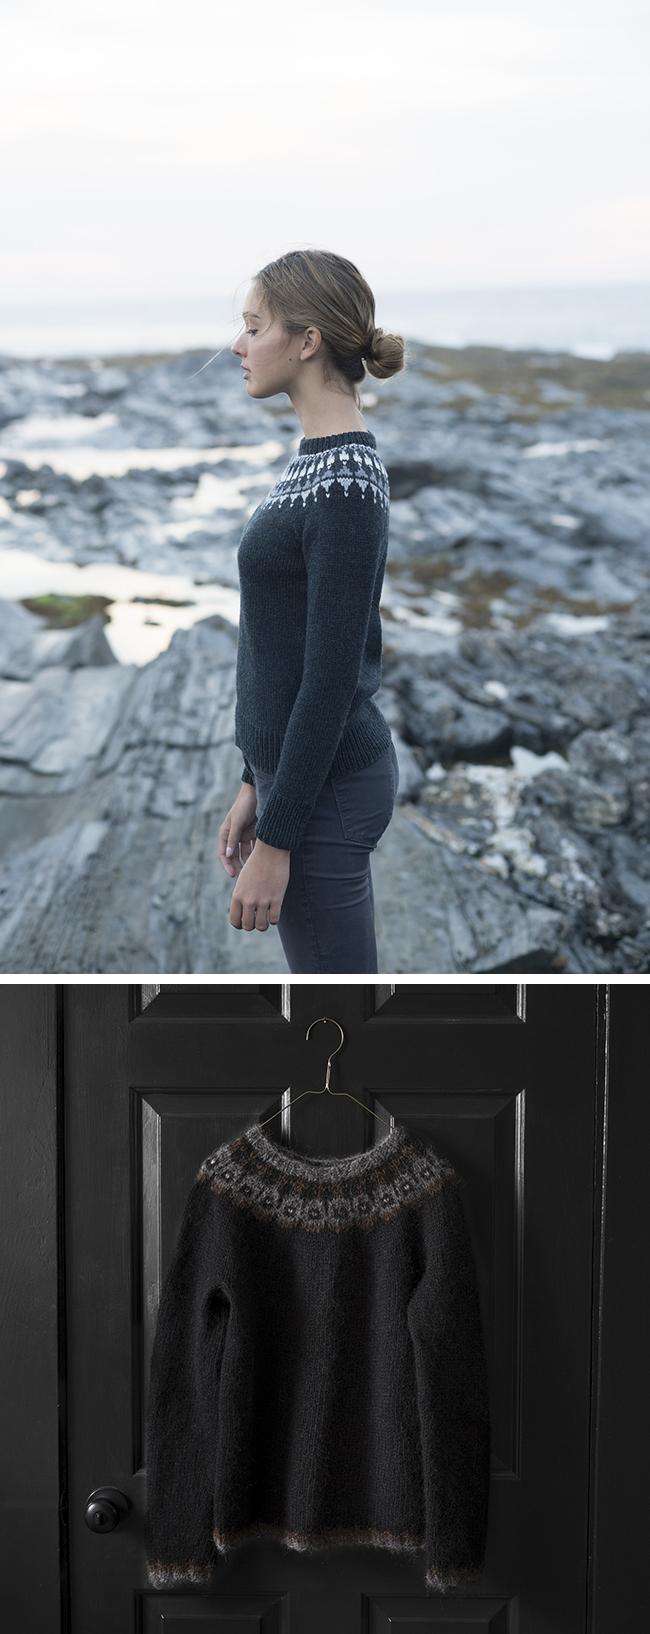 New Favorites: Dark yoke sweaters